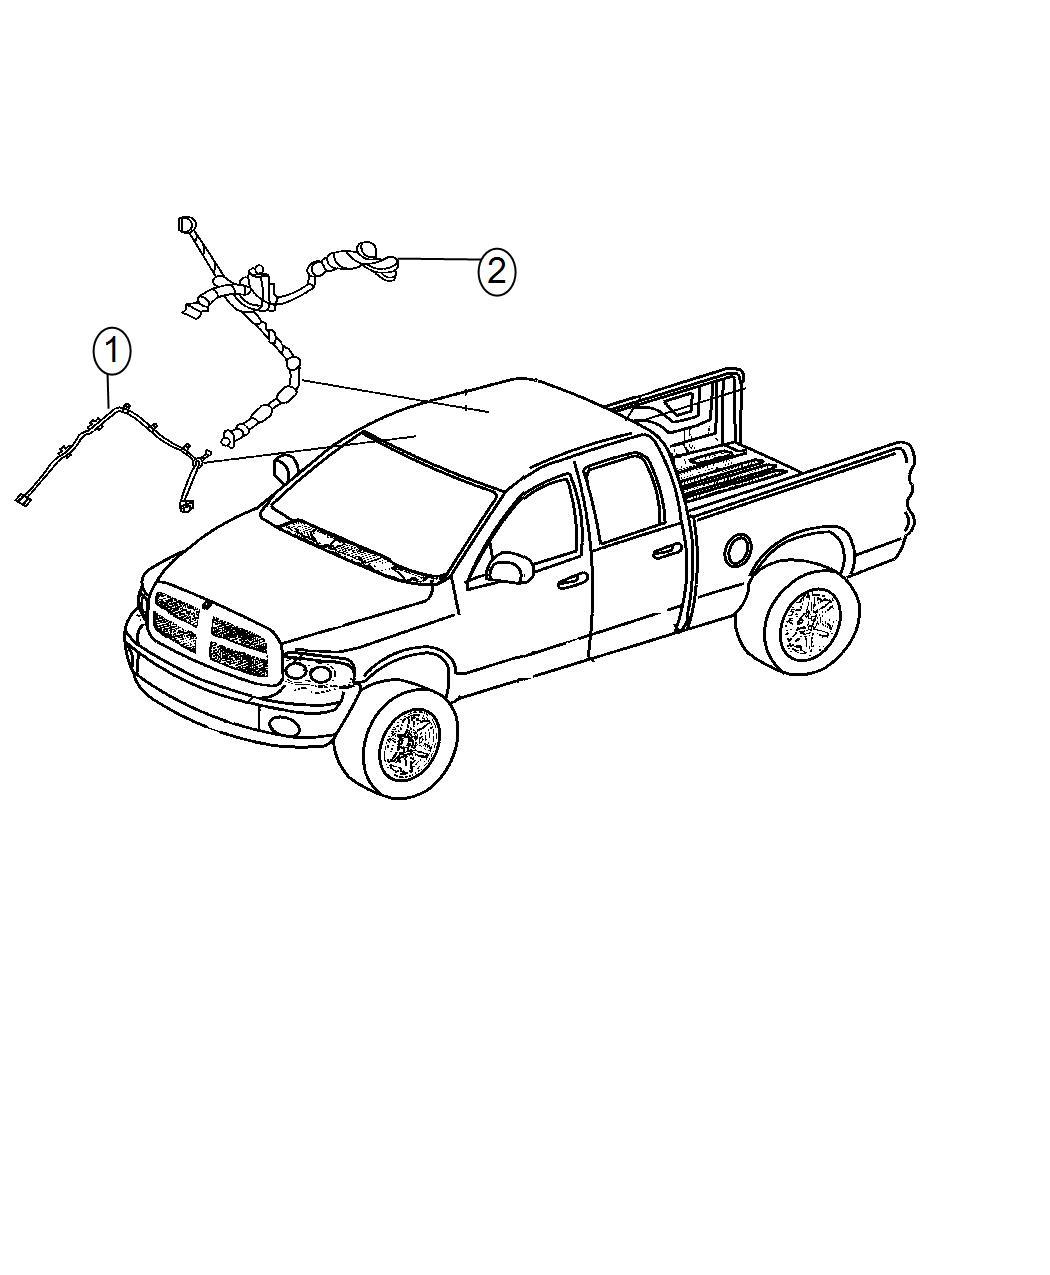 uconnect mirror wiring diagram